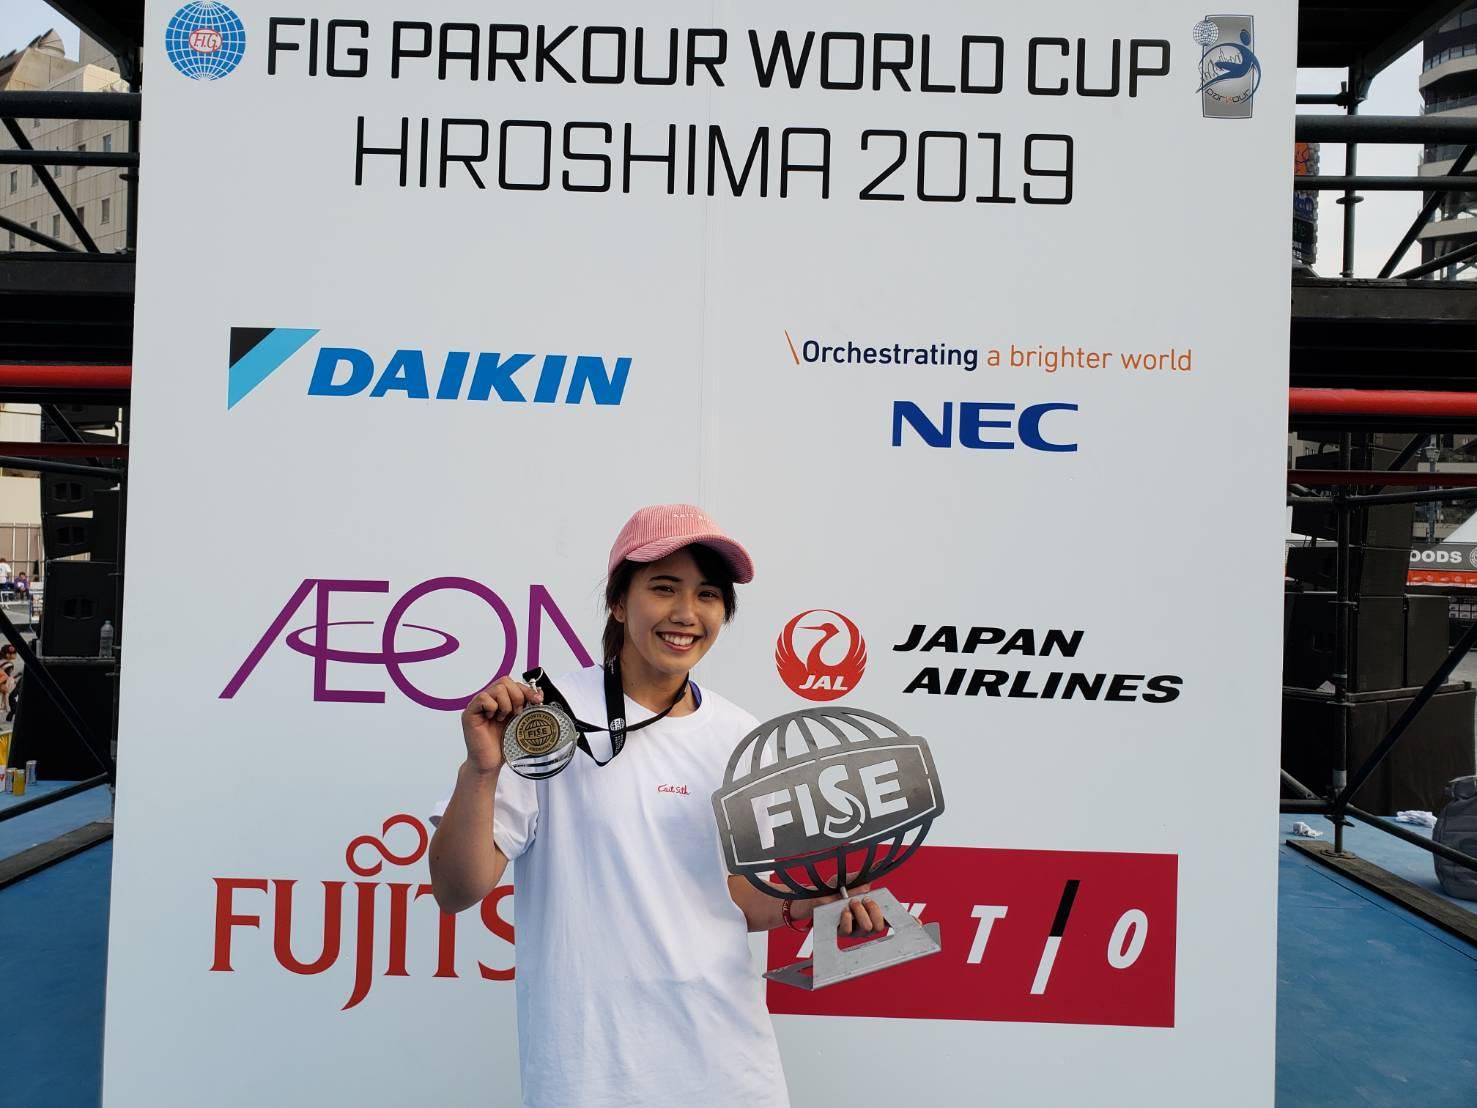 FISE HIROSHIMA 2019 -